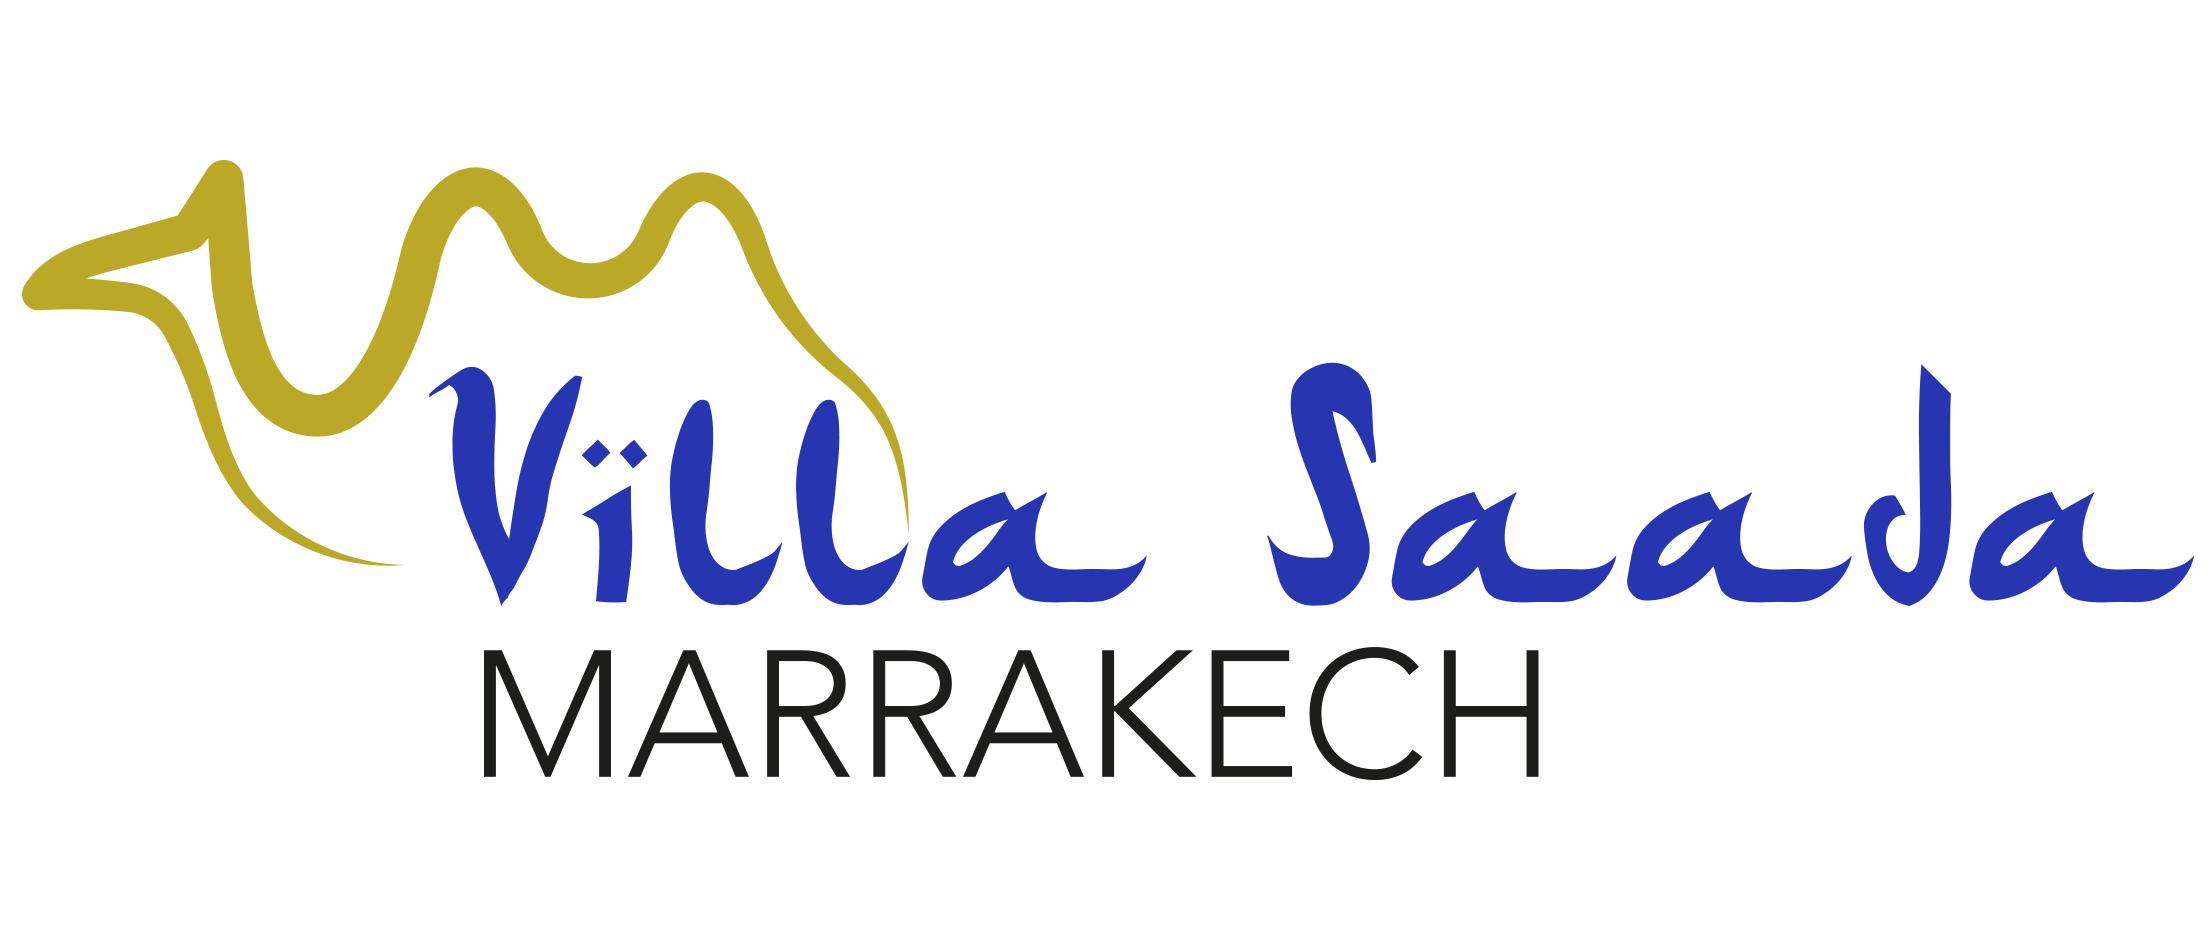 Villa Saada Marrakech